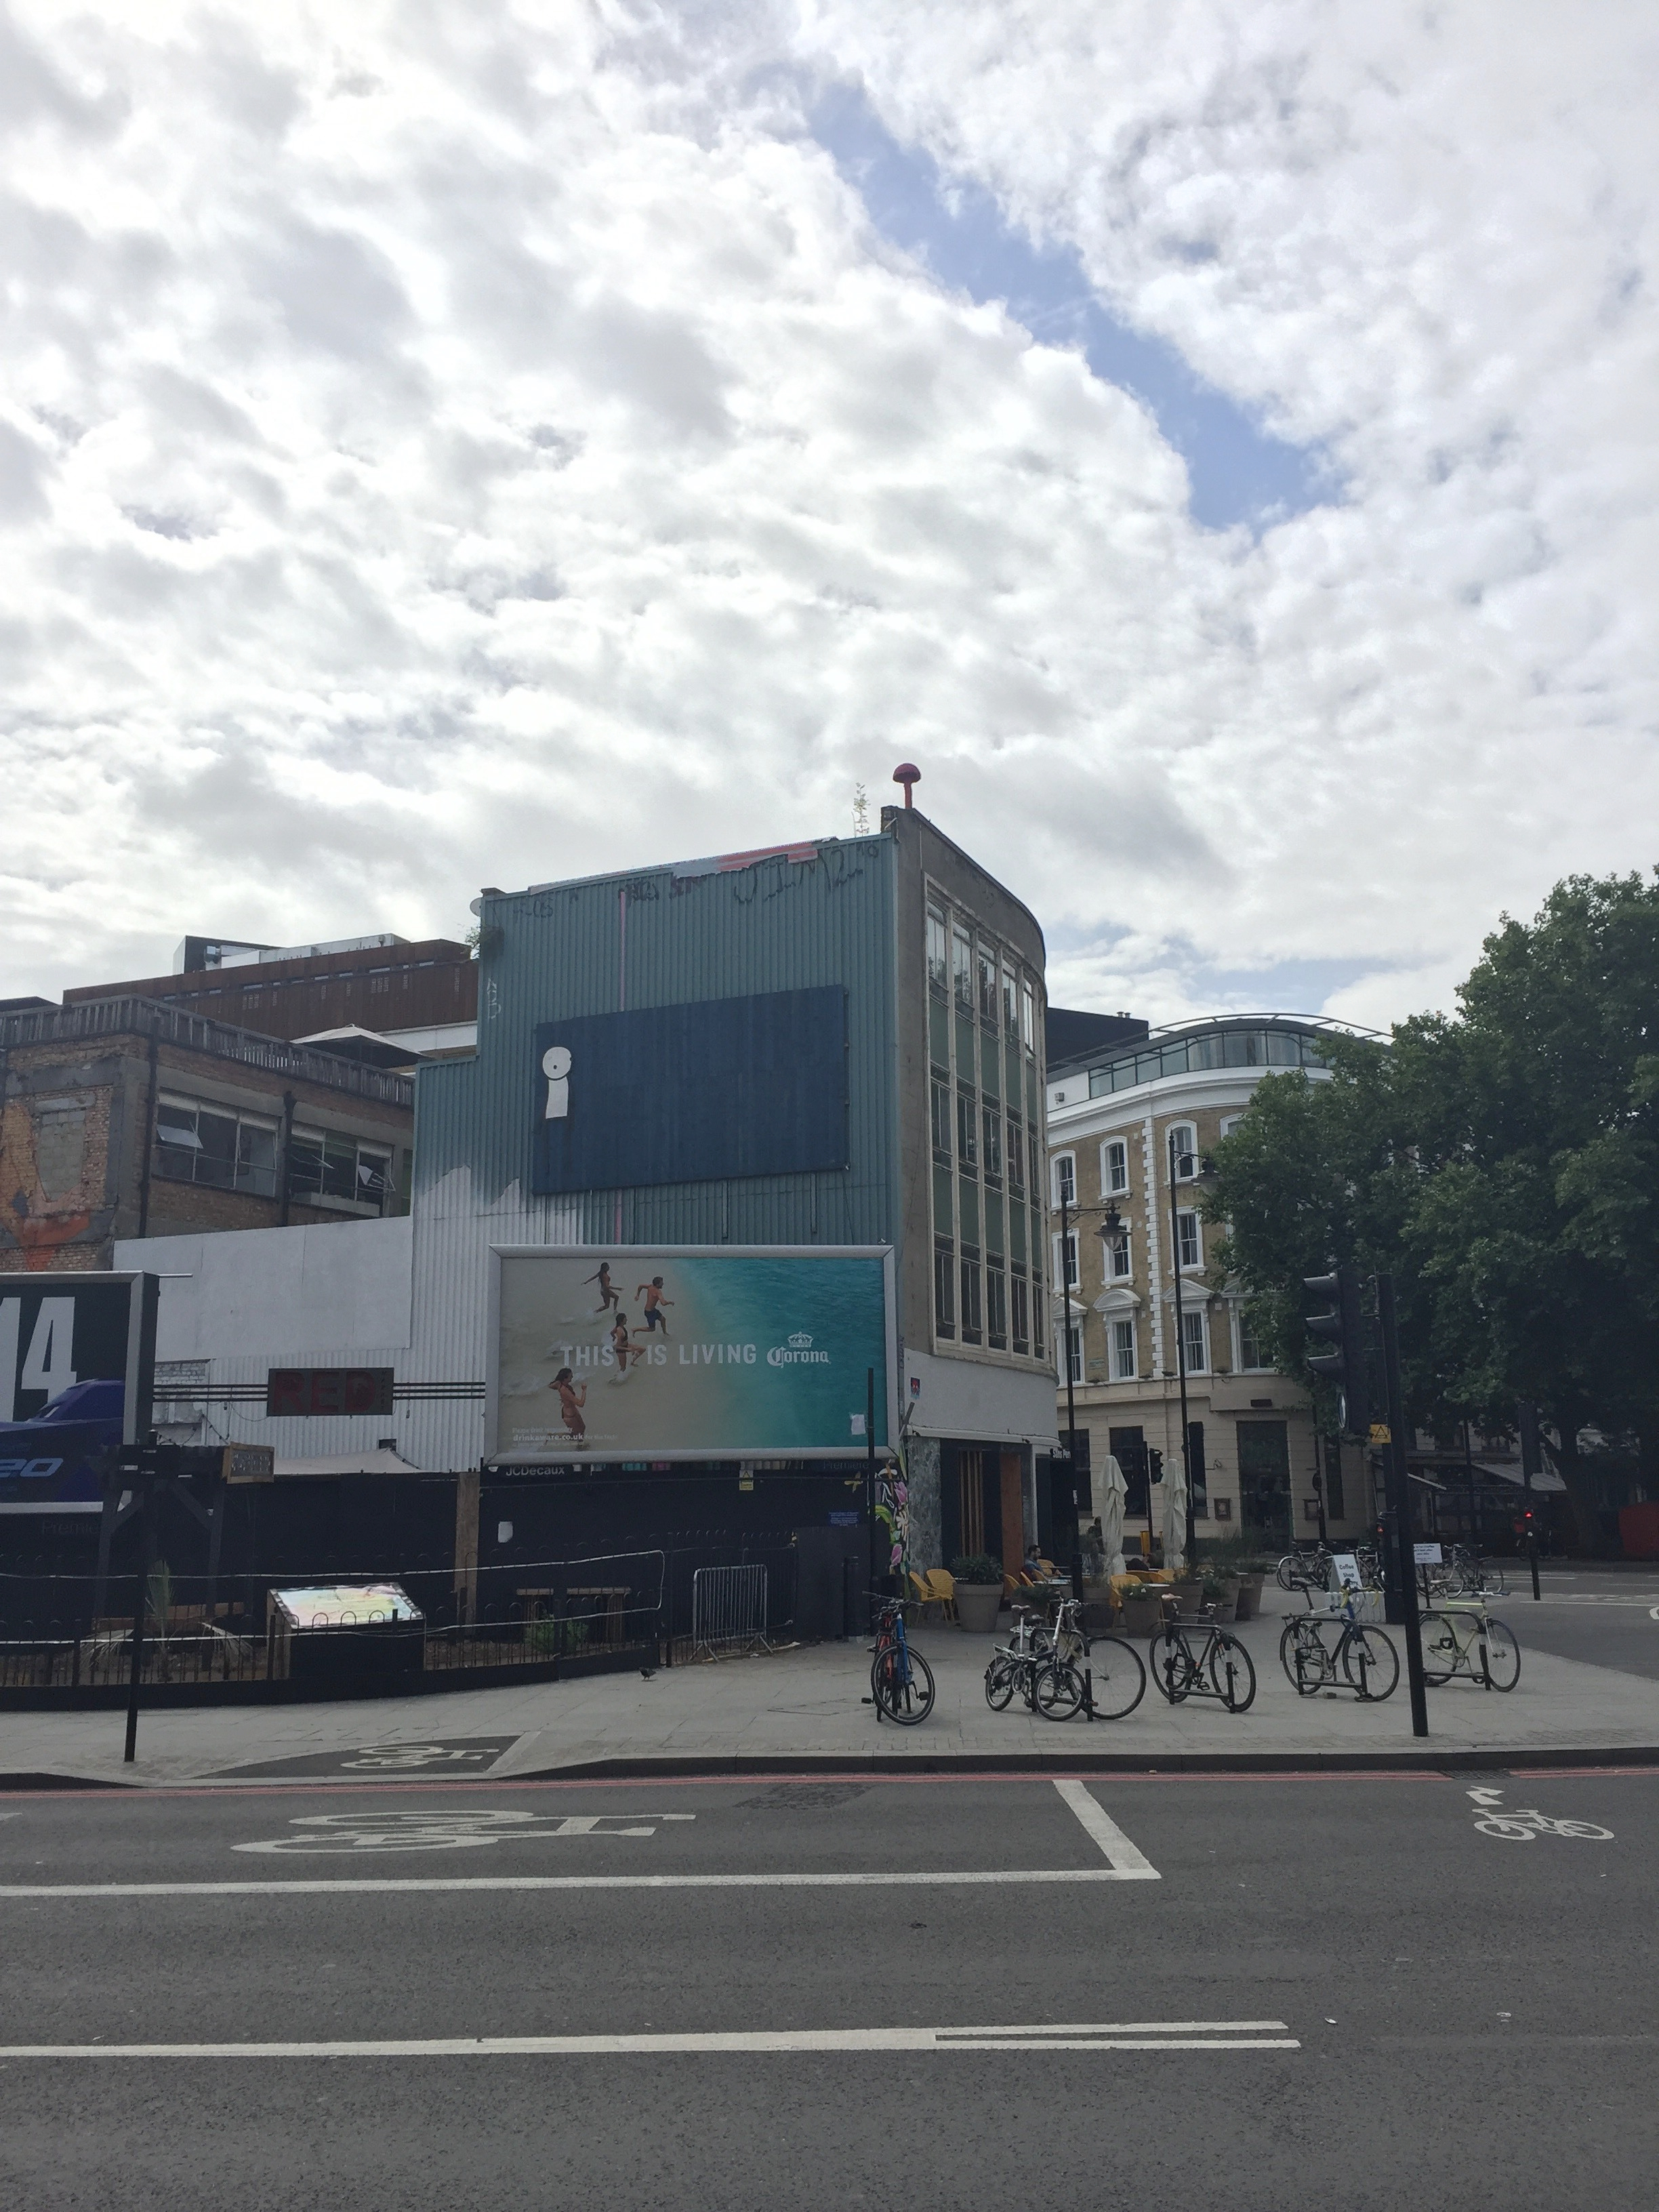 Stik in London